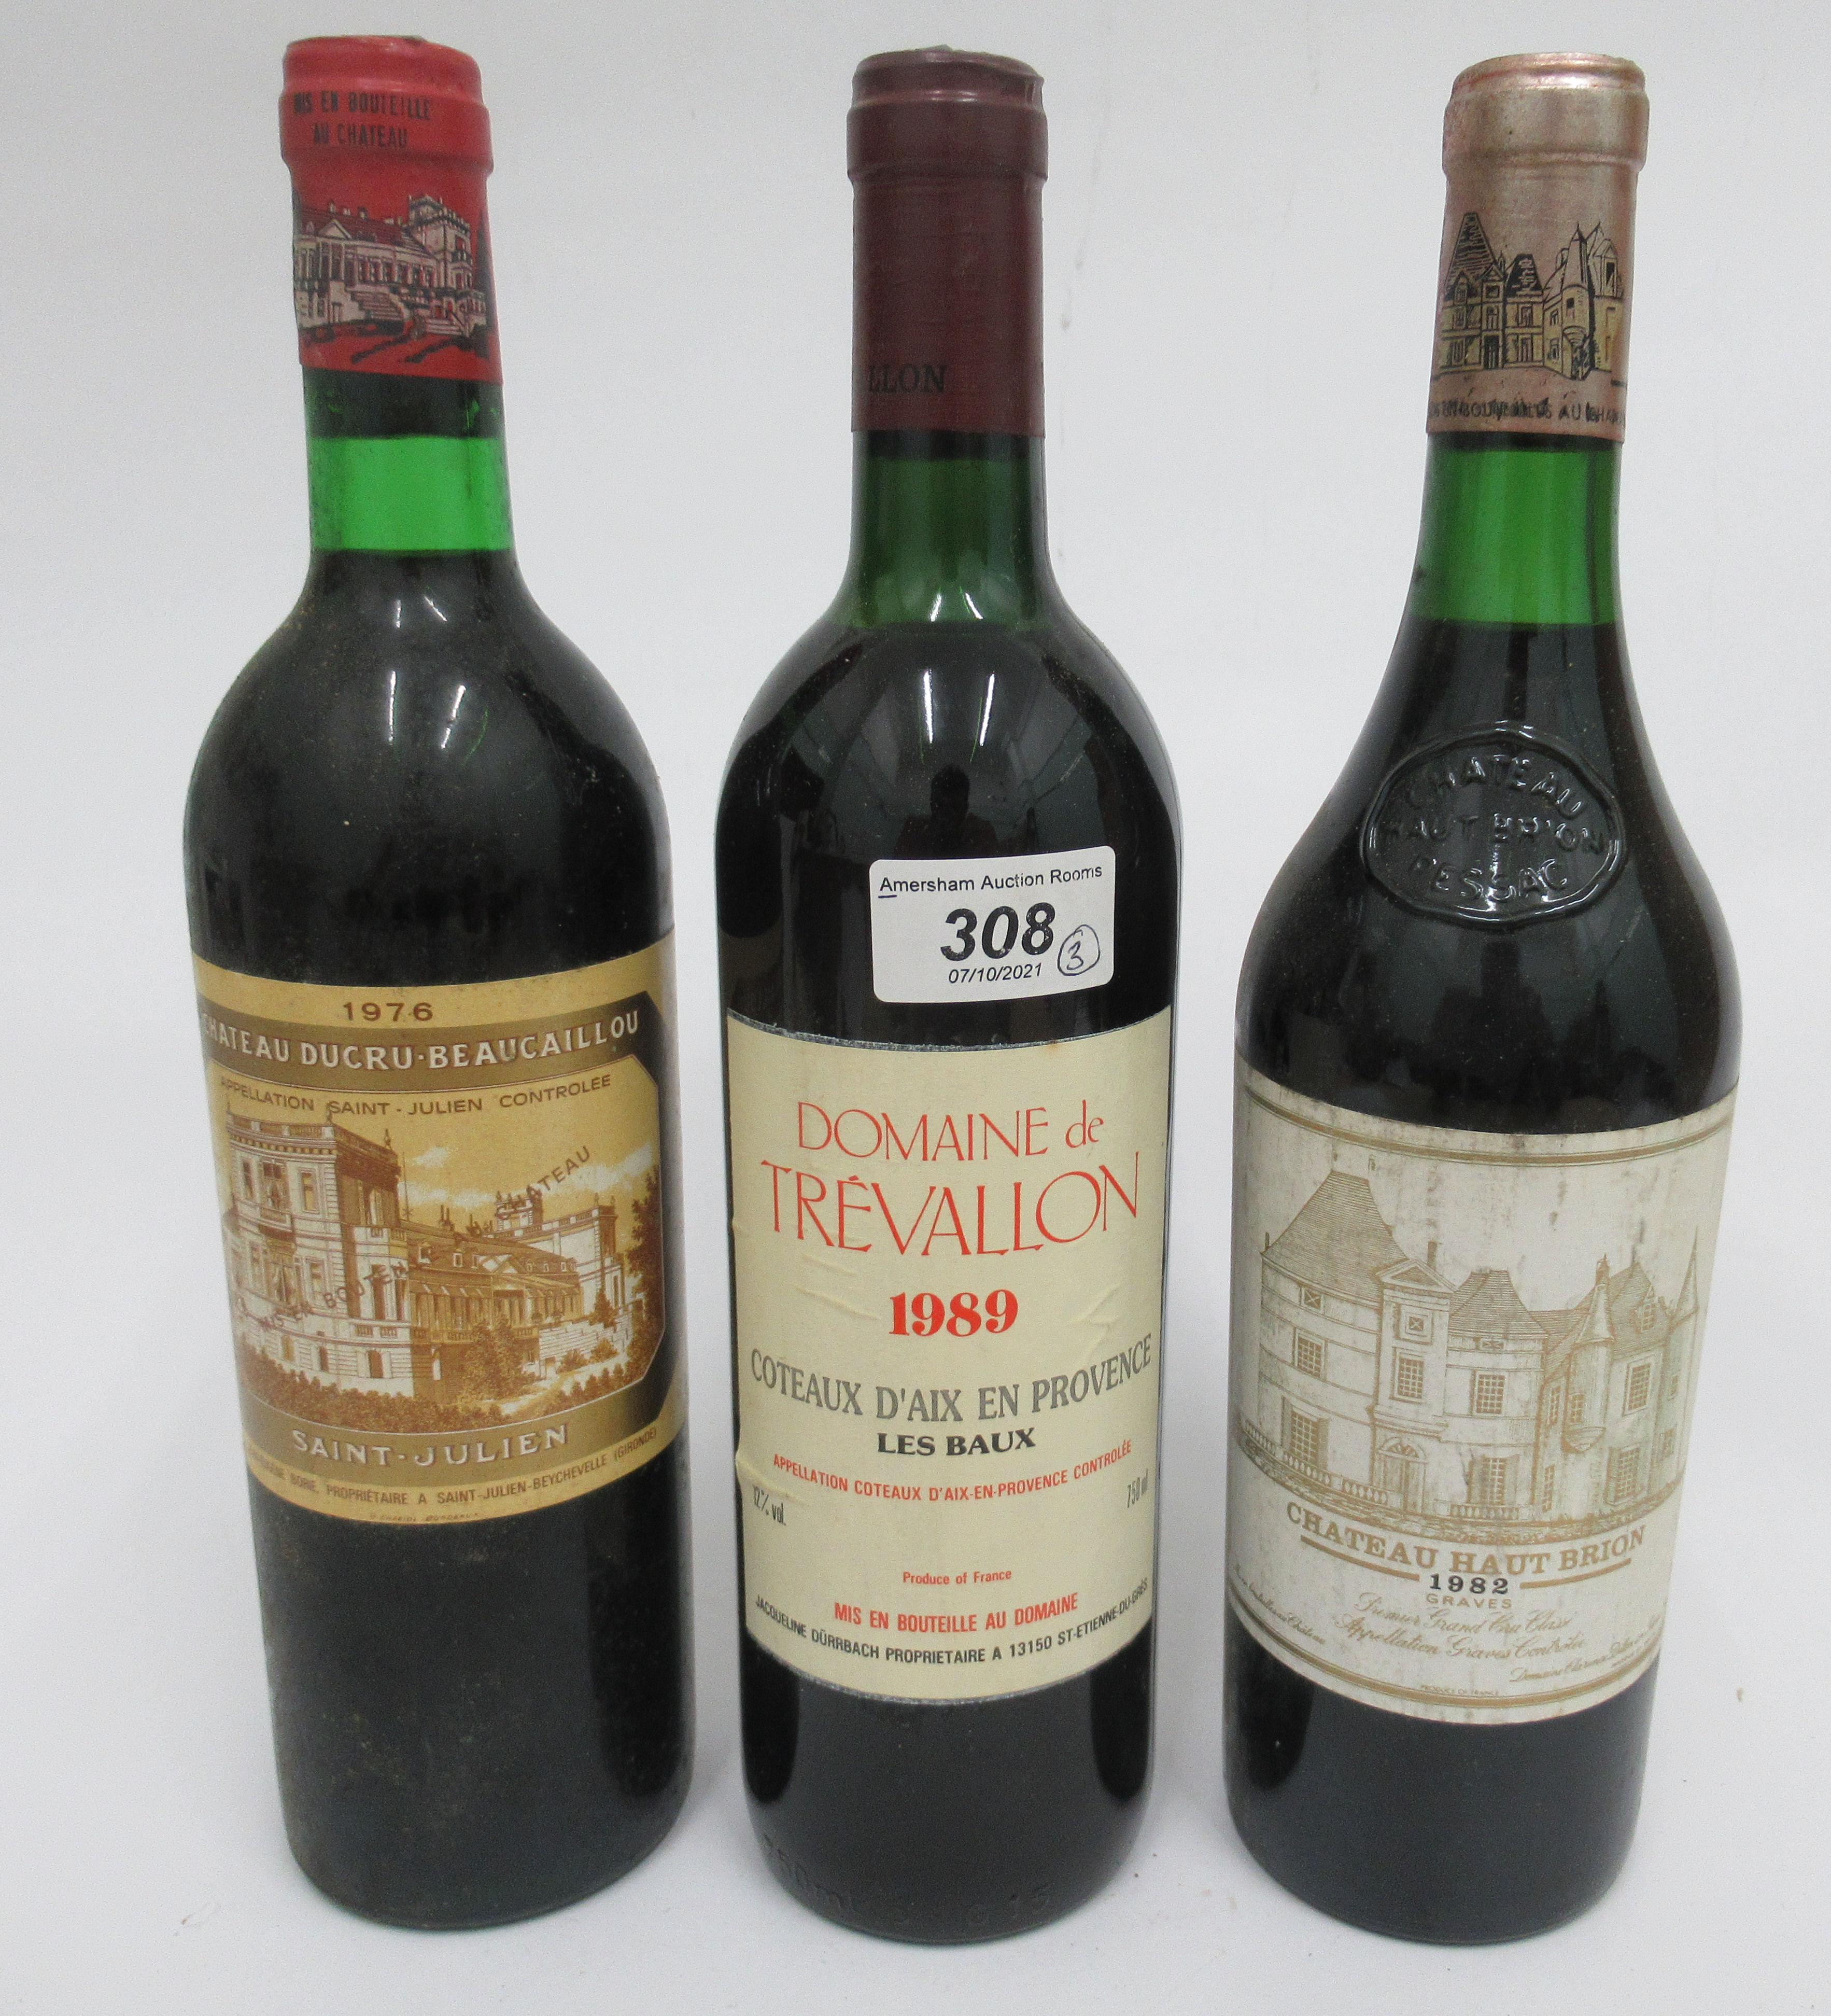 Wine, viz. a 1976 Chateau Ducru Beaucaillou; a 1989 Domaine de Trevelin; and a 1982 Chateau Haut-